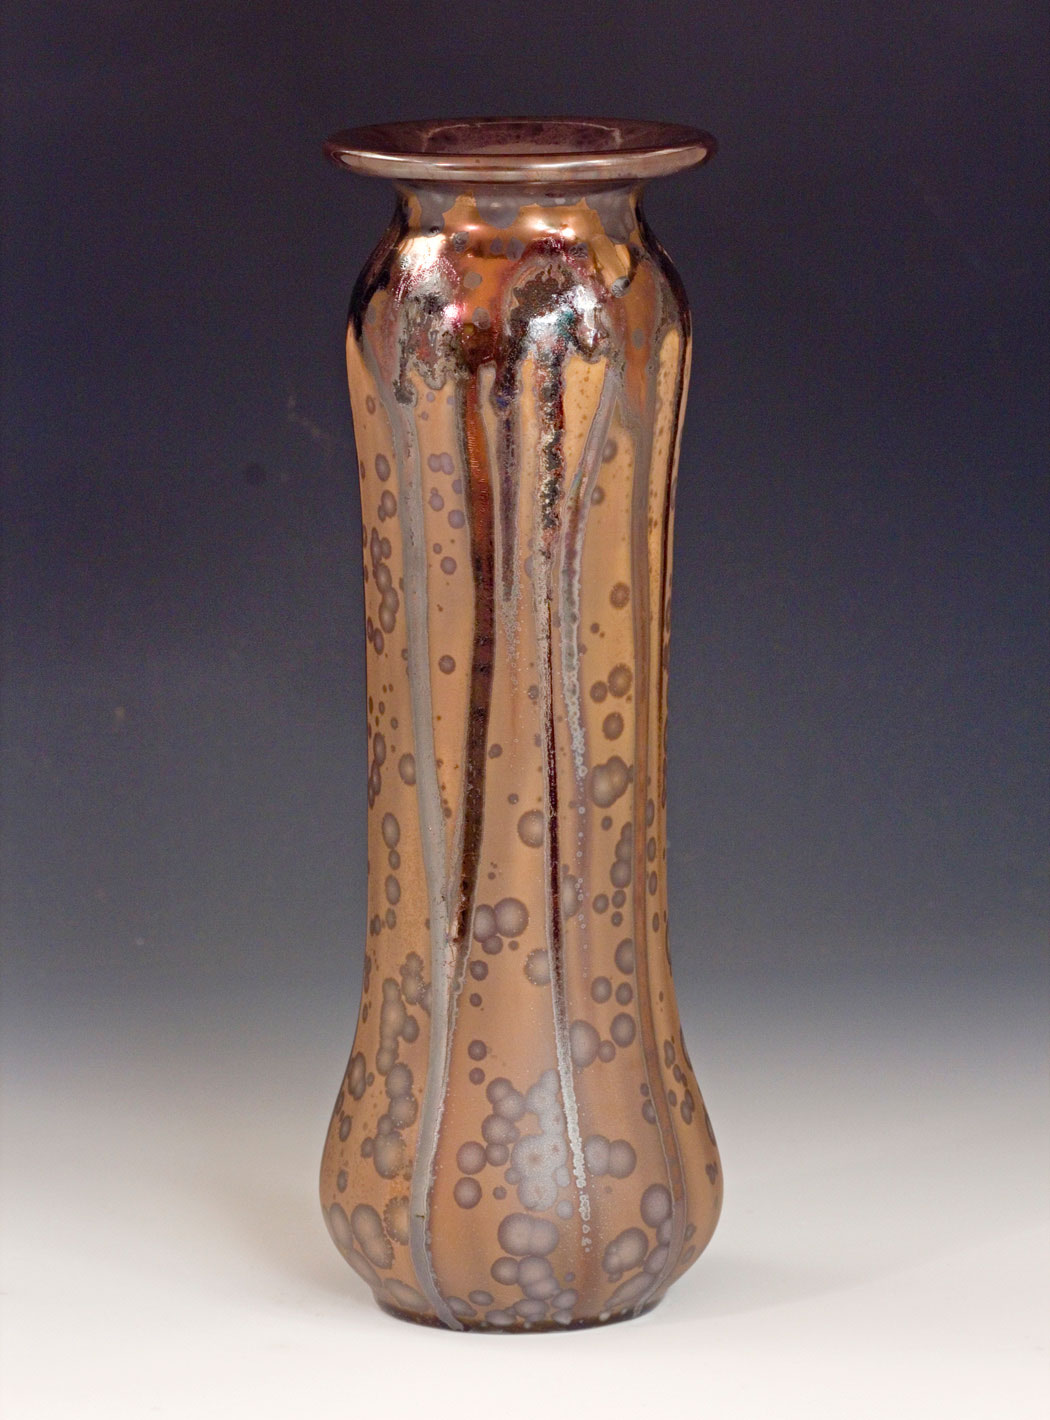 Art-Pottery-molybdenum-matte-crystalline-Vase-Samantha-Henneke-Seagrove-NC.jpg